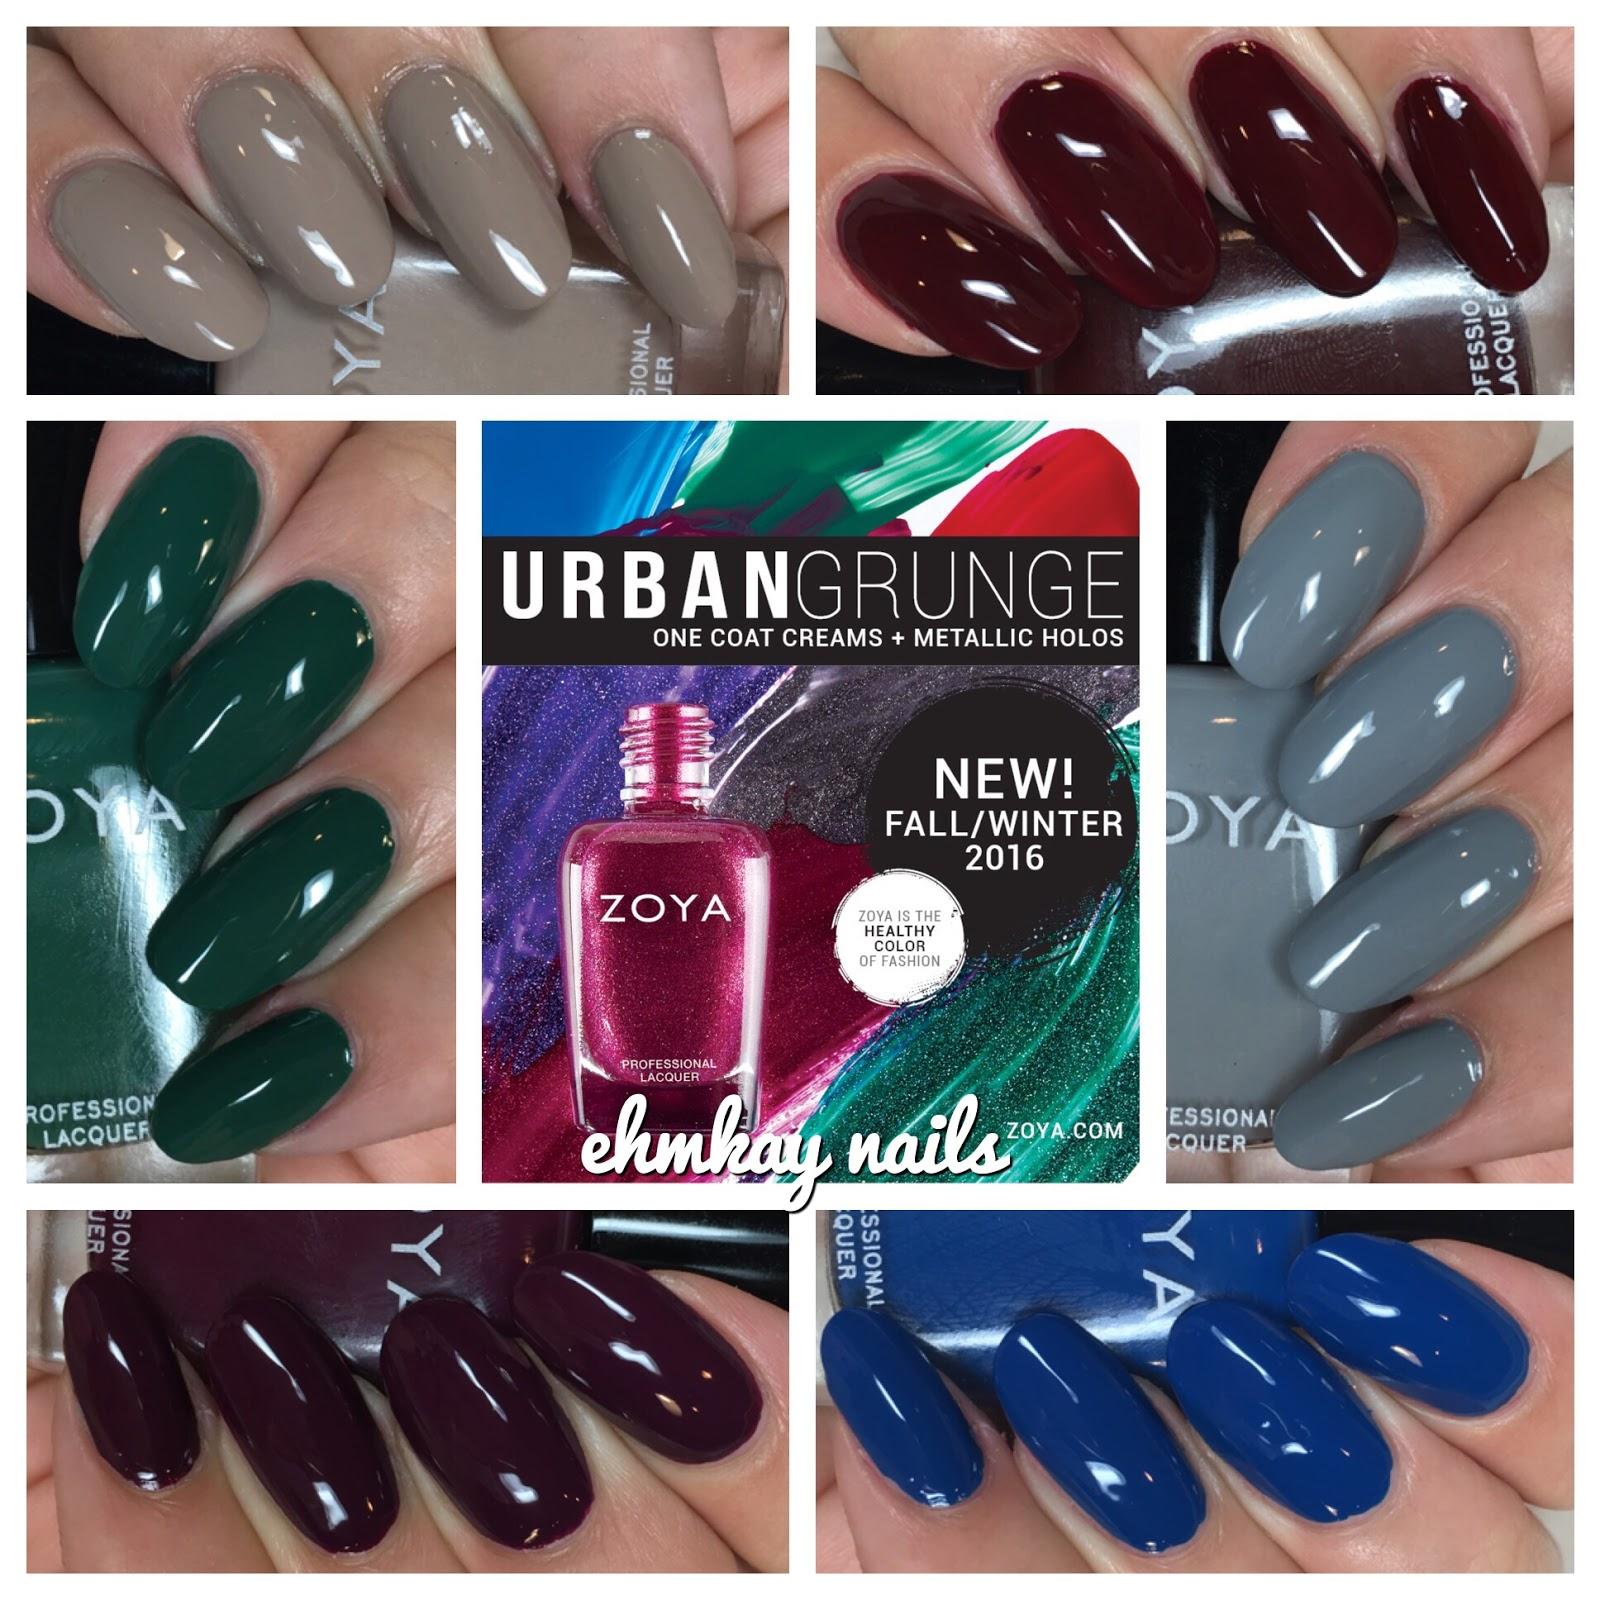 ehmkay nails: Zoya Urban Grunge Cremes for Fall 2016 + Comparisons